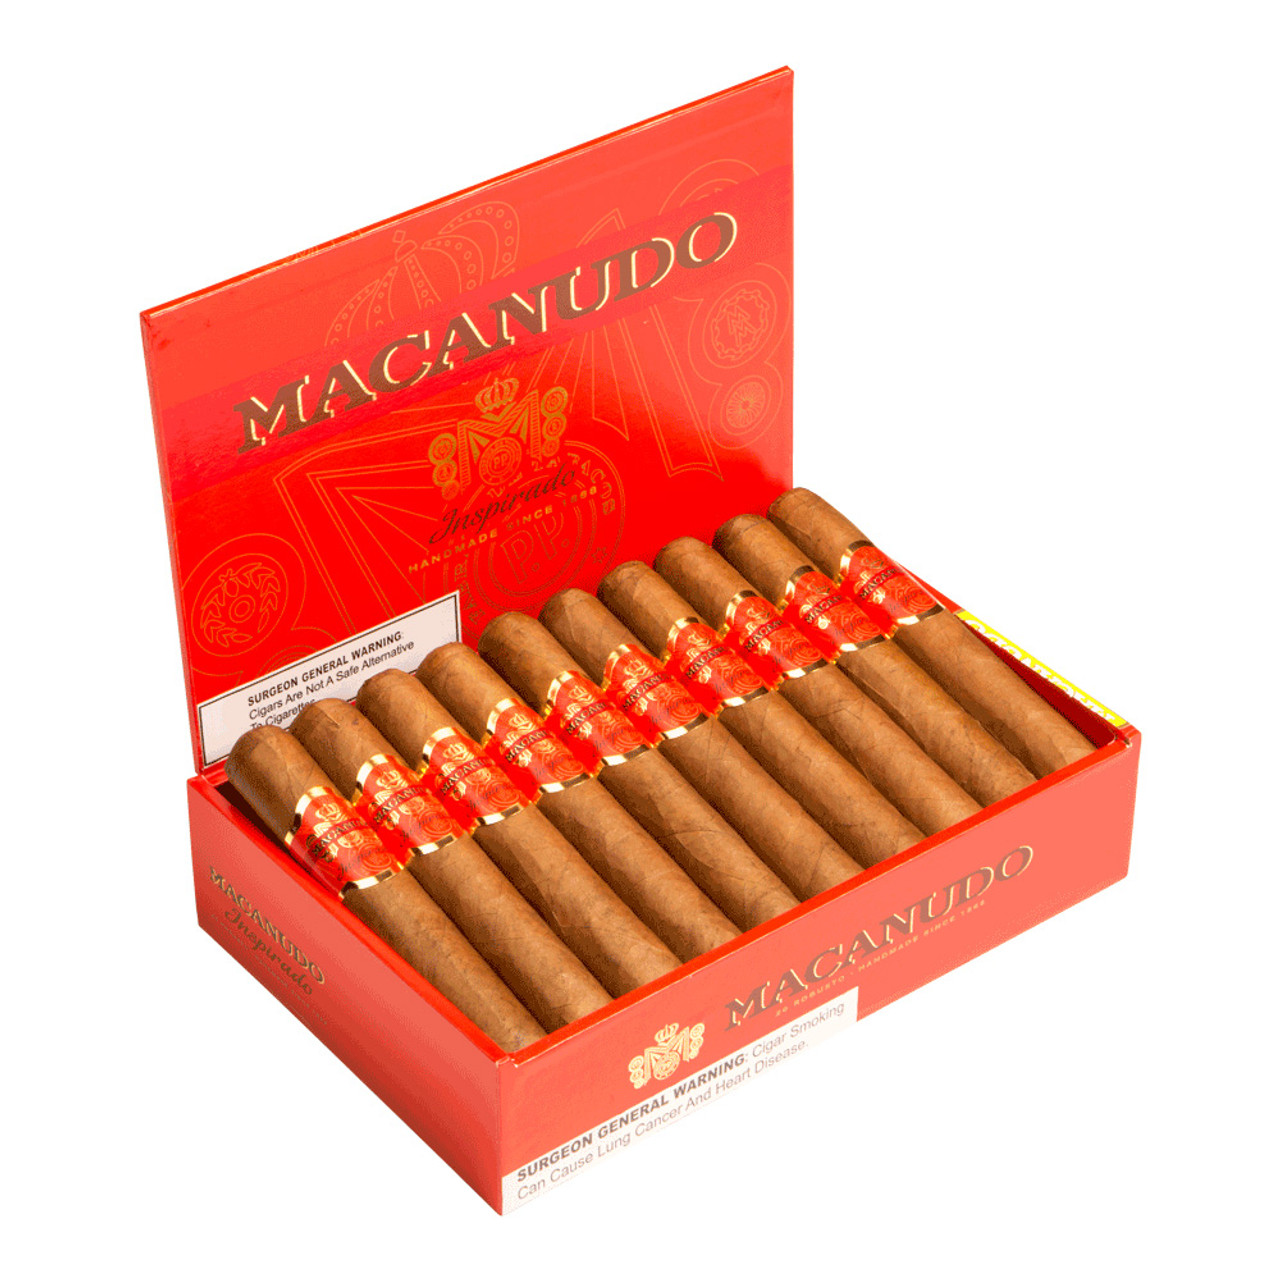 Macanudo Inspirado Orange Toro Cigars - 5.75 x 52 (Box of 20)